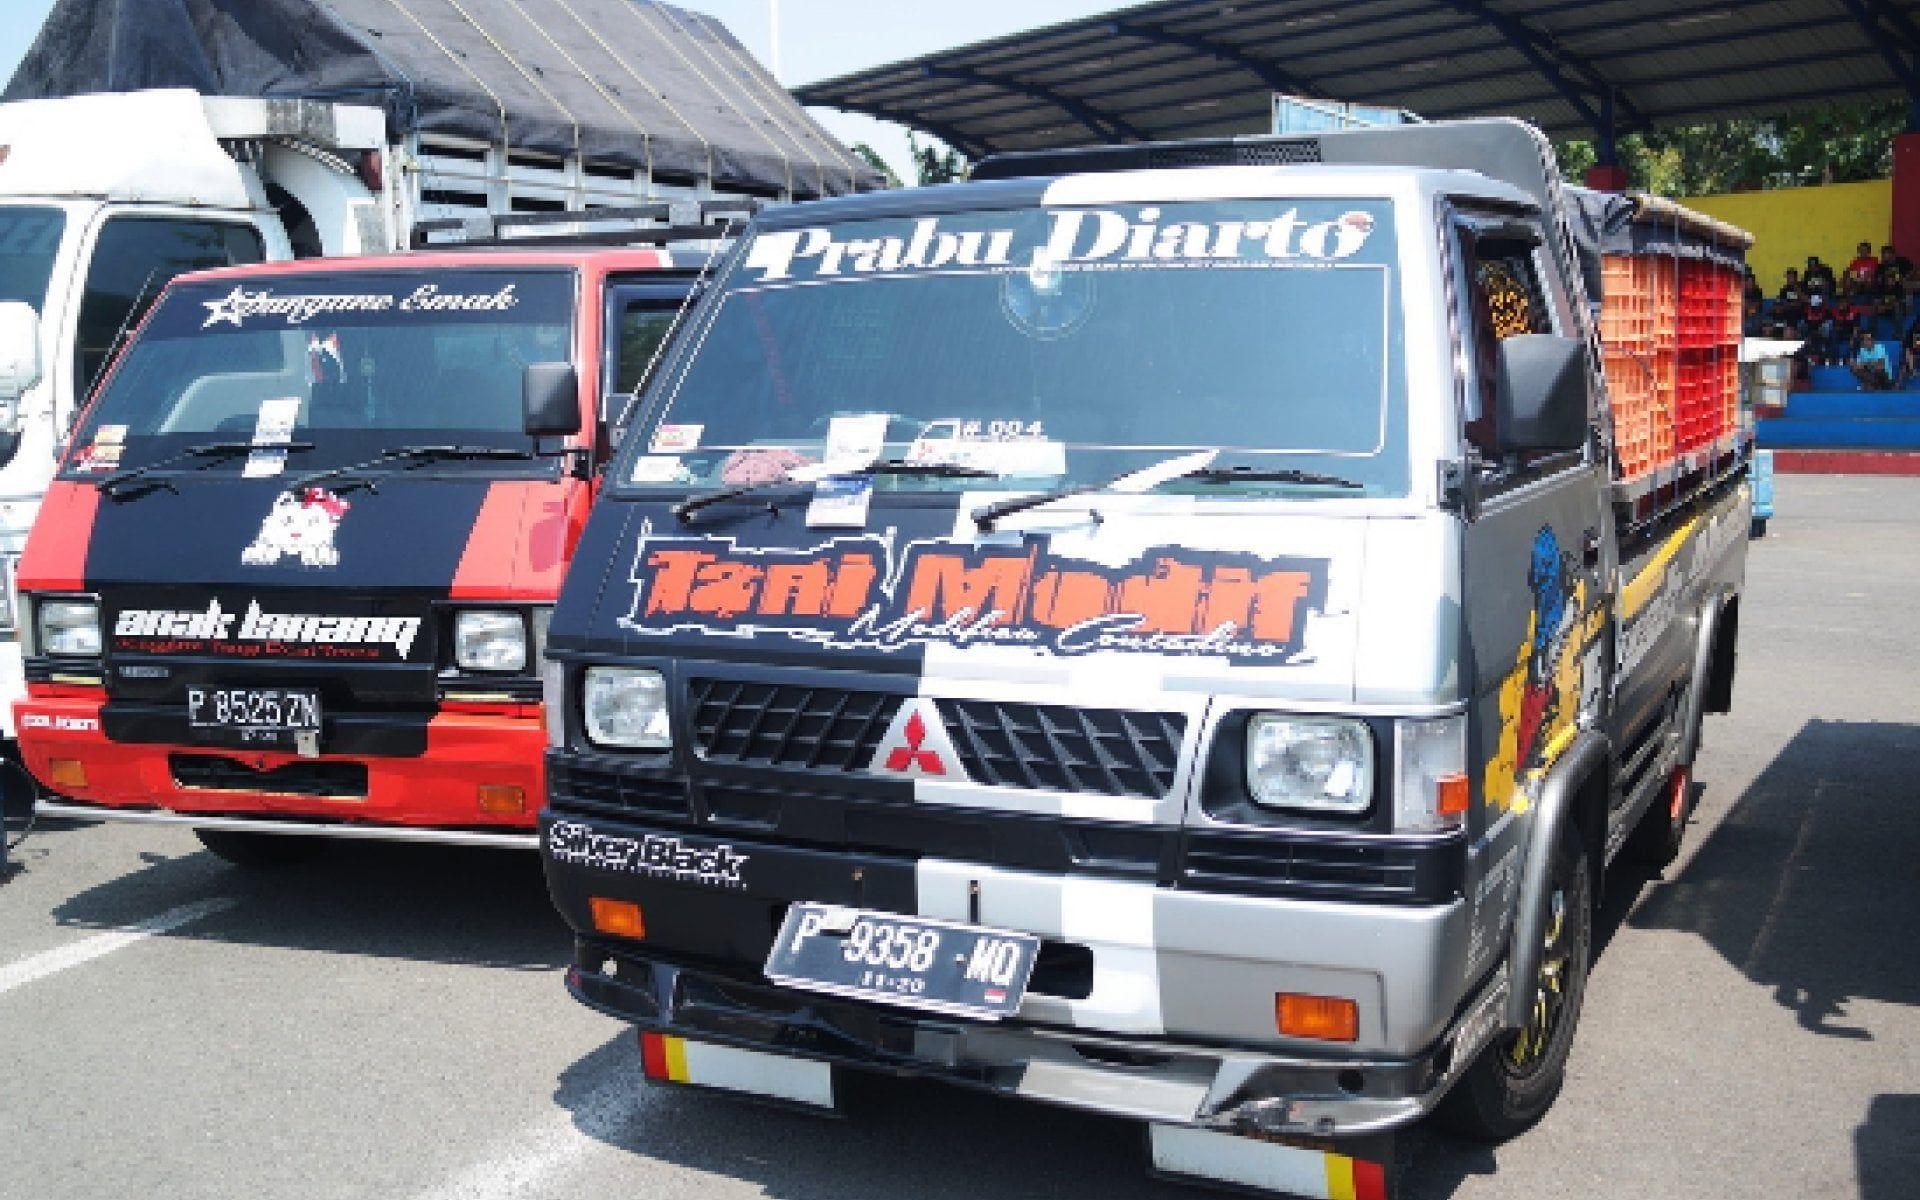 Modifikasi Mobil L300 Pick Up 2016 Modifikasi Mobil Mobil Perbaikan Mobil